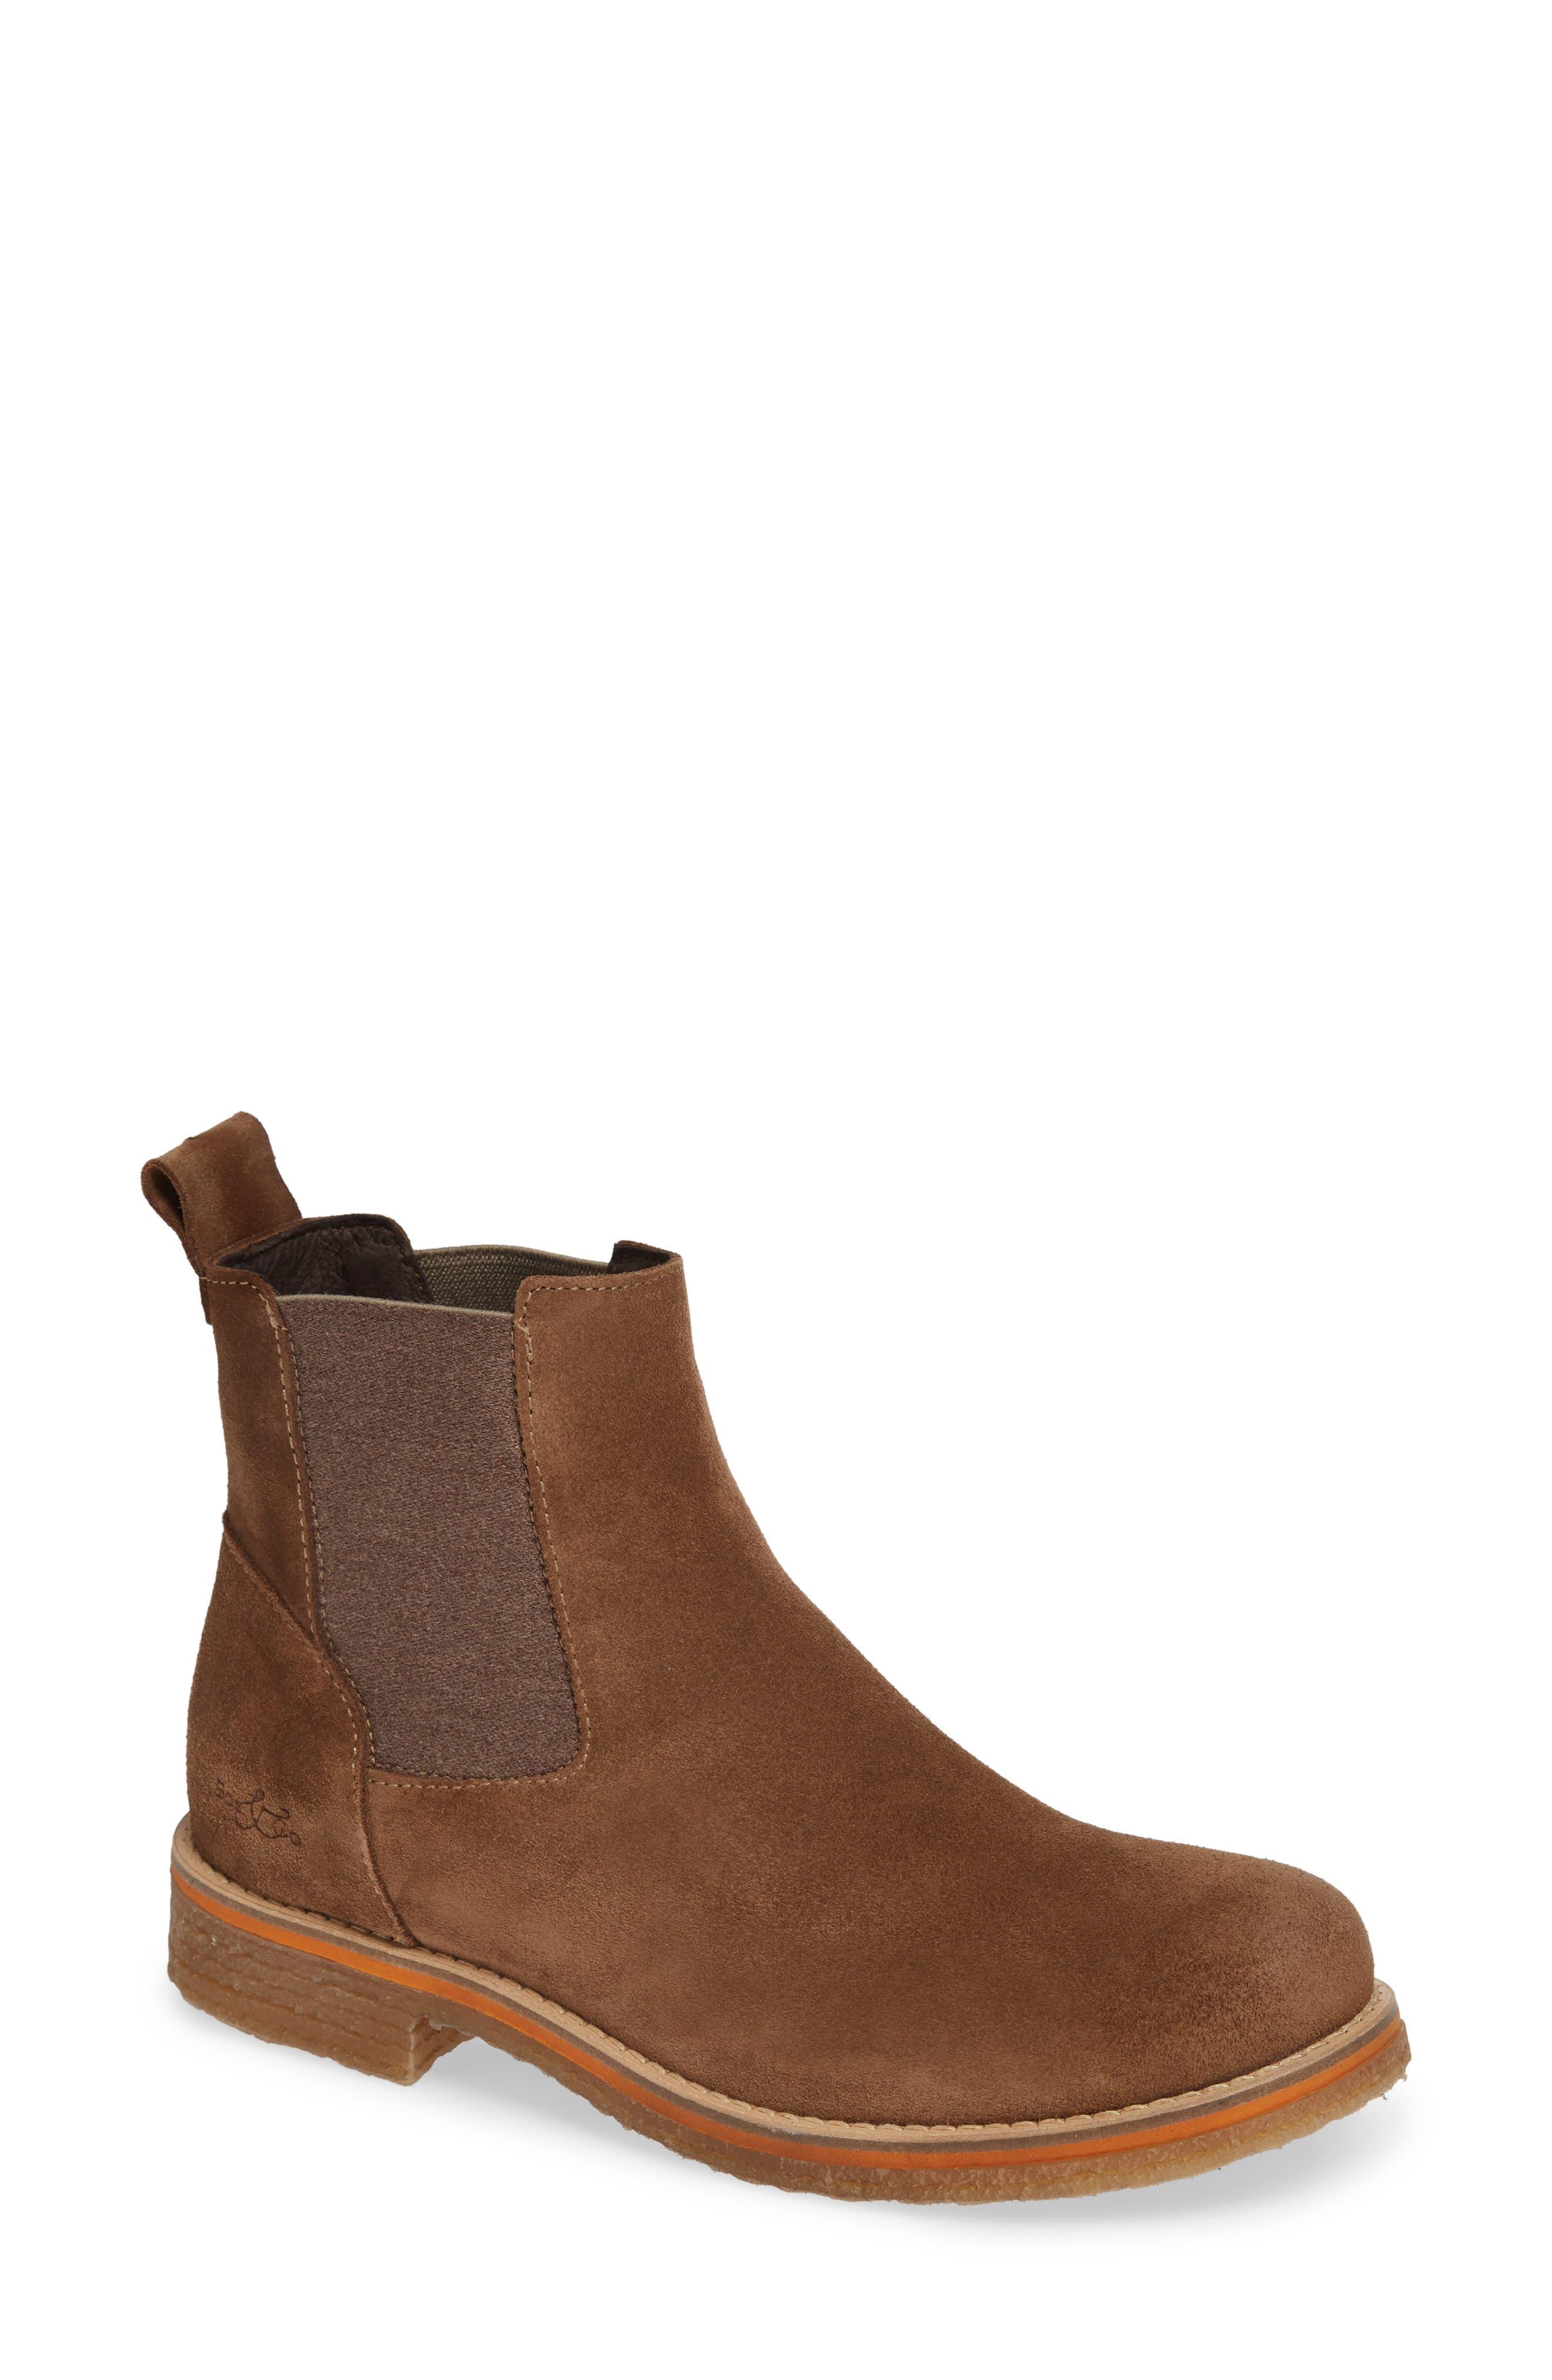 Bos. & Co. Basin Chelsea Boot, Beige